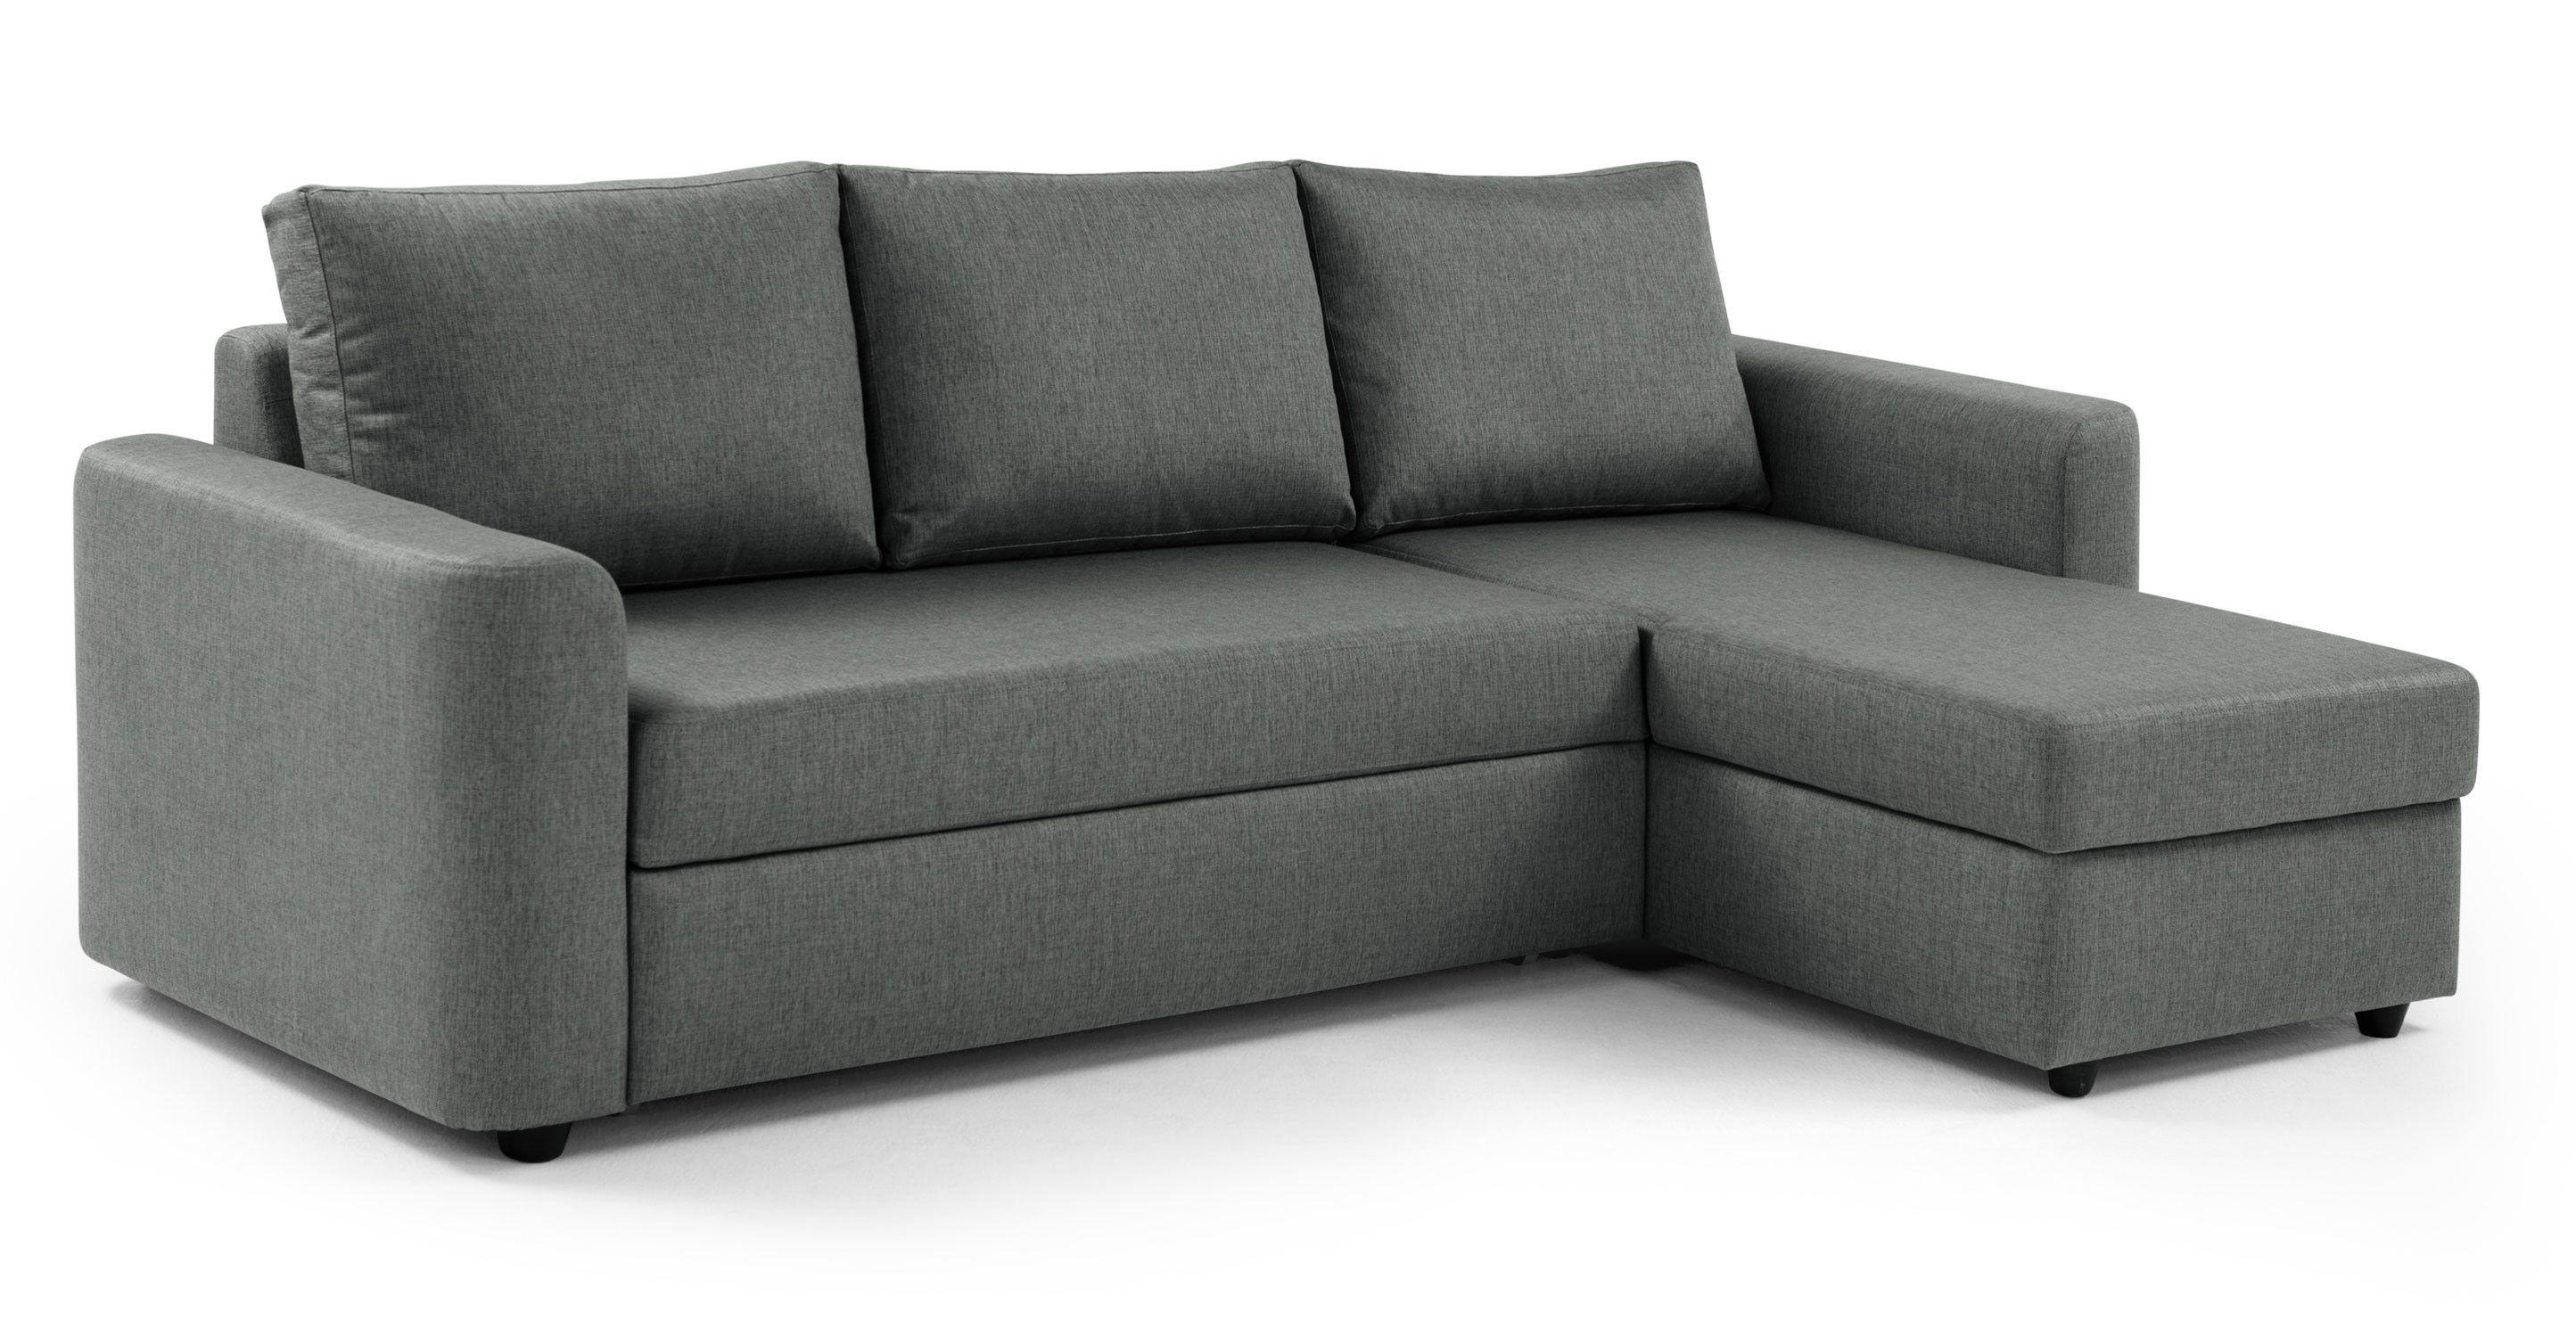 Albie Right Hand Facing Corner Storage Sofa Bed, Steeple